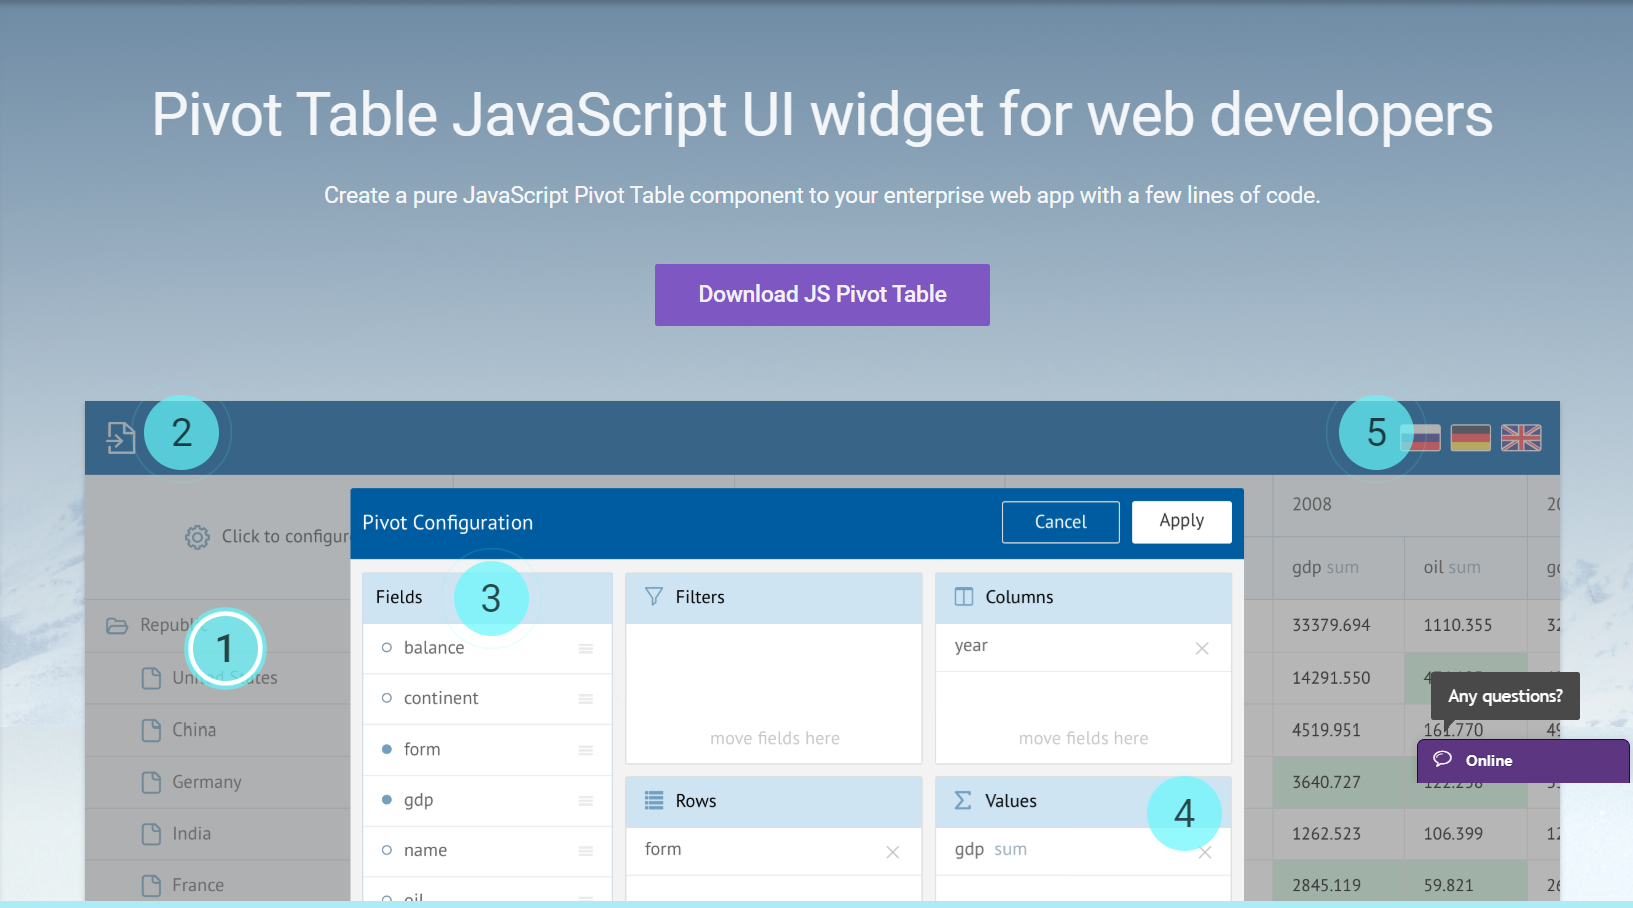 Top 6 UI Widgets for Business Web Applications- Pivot